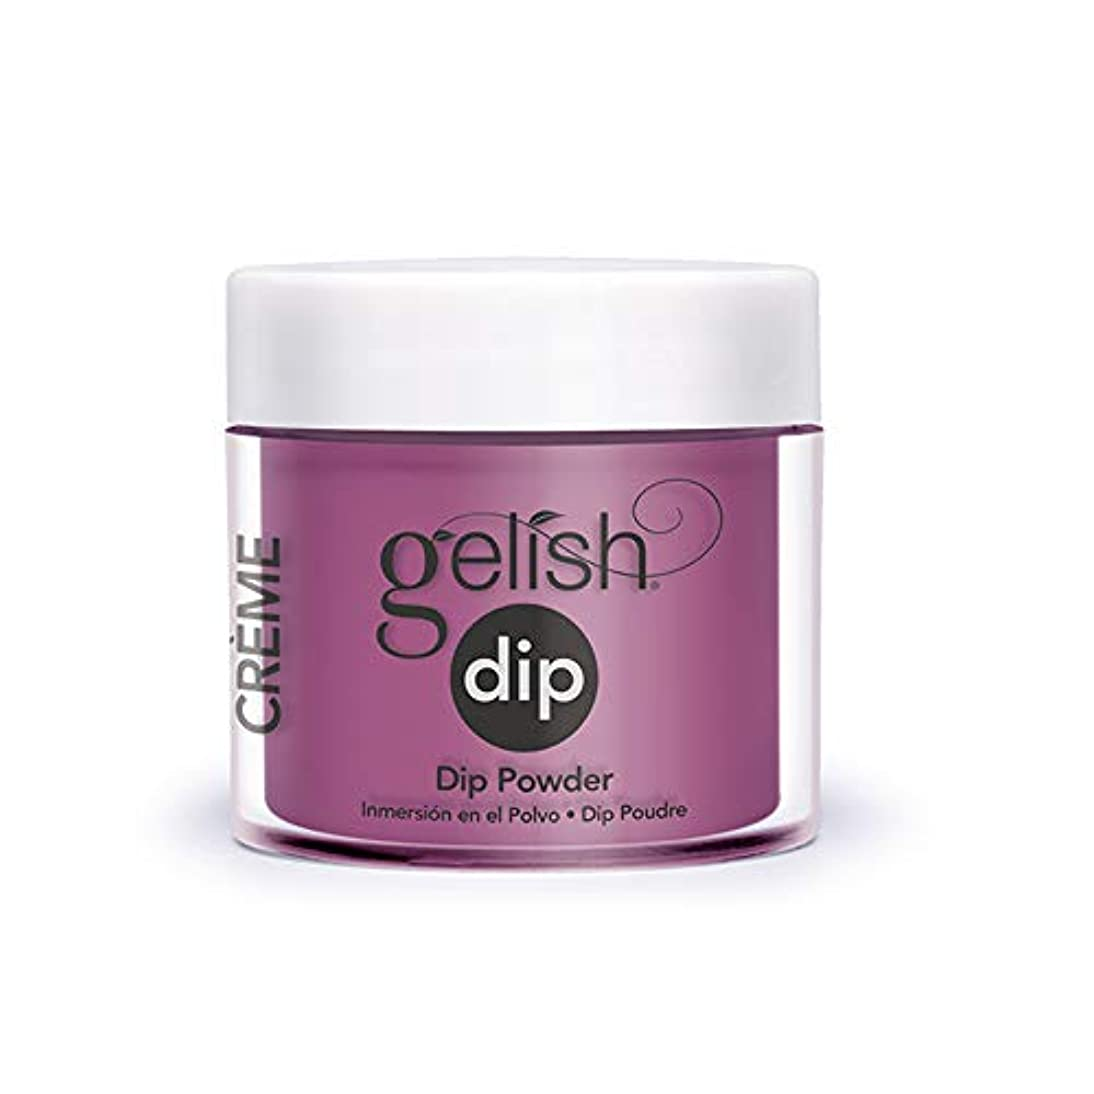 Harmony Gelish - Acrylic Dip Powder - Plum and Done - 23g / 0.8oz